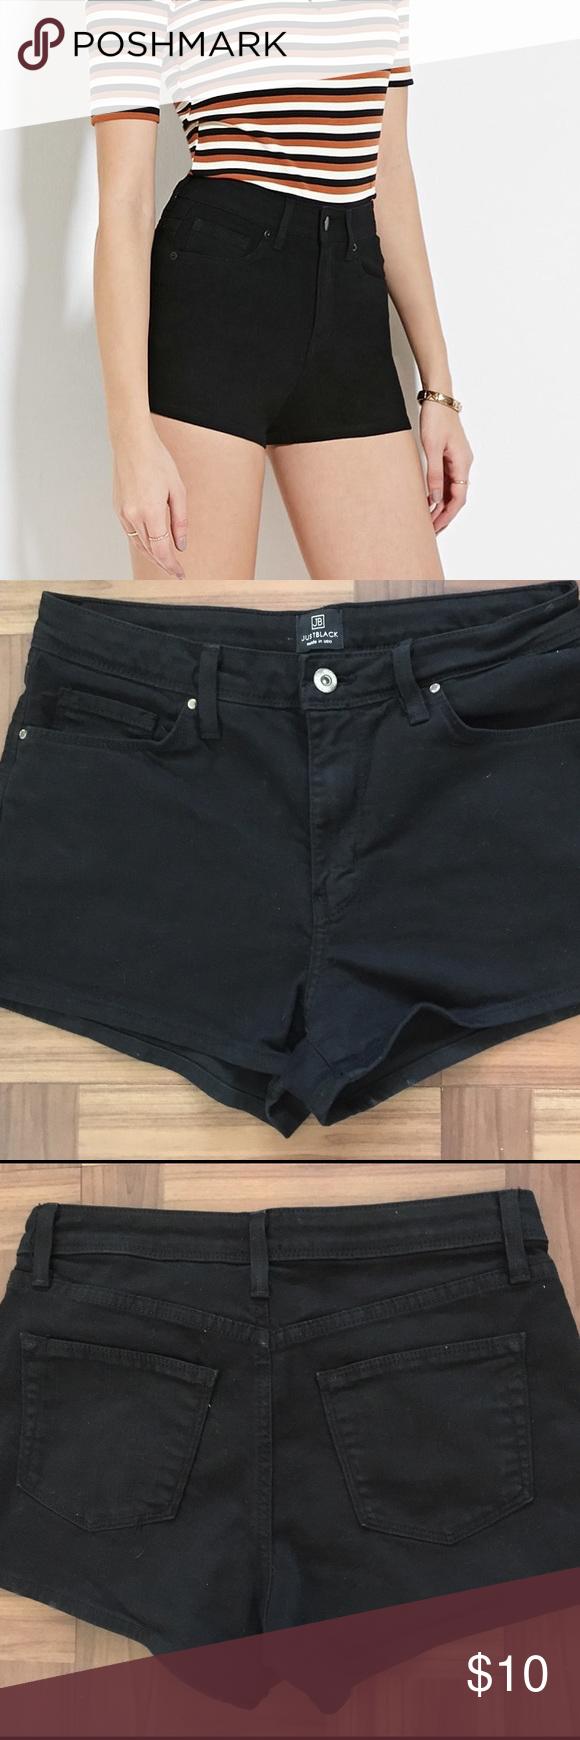 Sale!! Black denim shorts 👽 Black denim shorts. Size small. Like new Forever 21 Shorts Jean Shorts